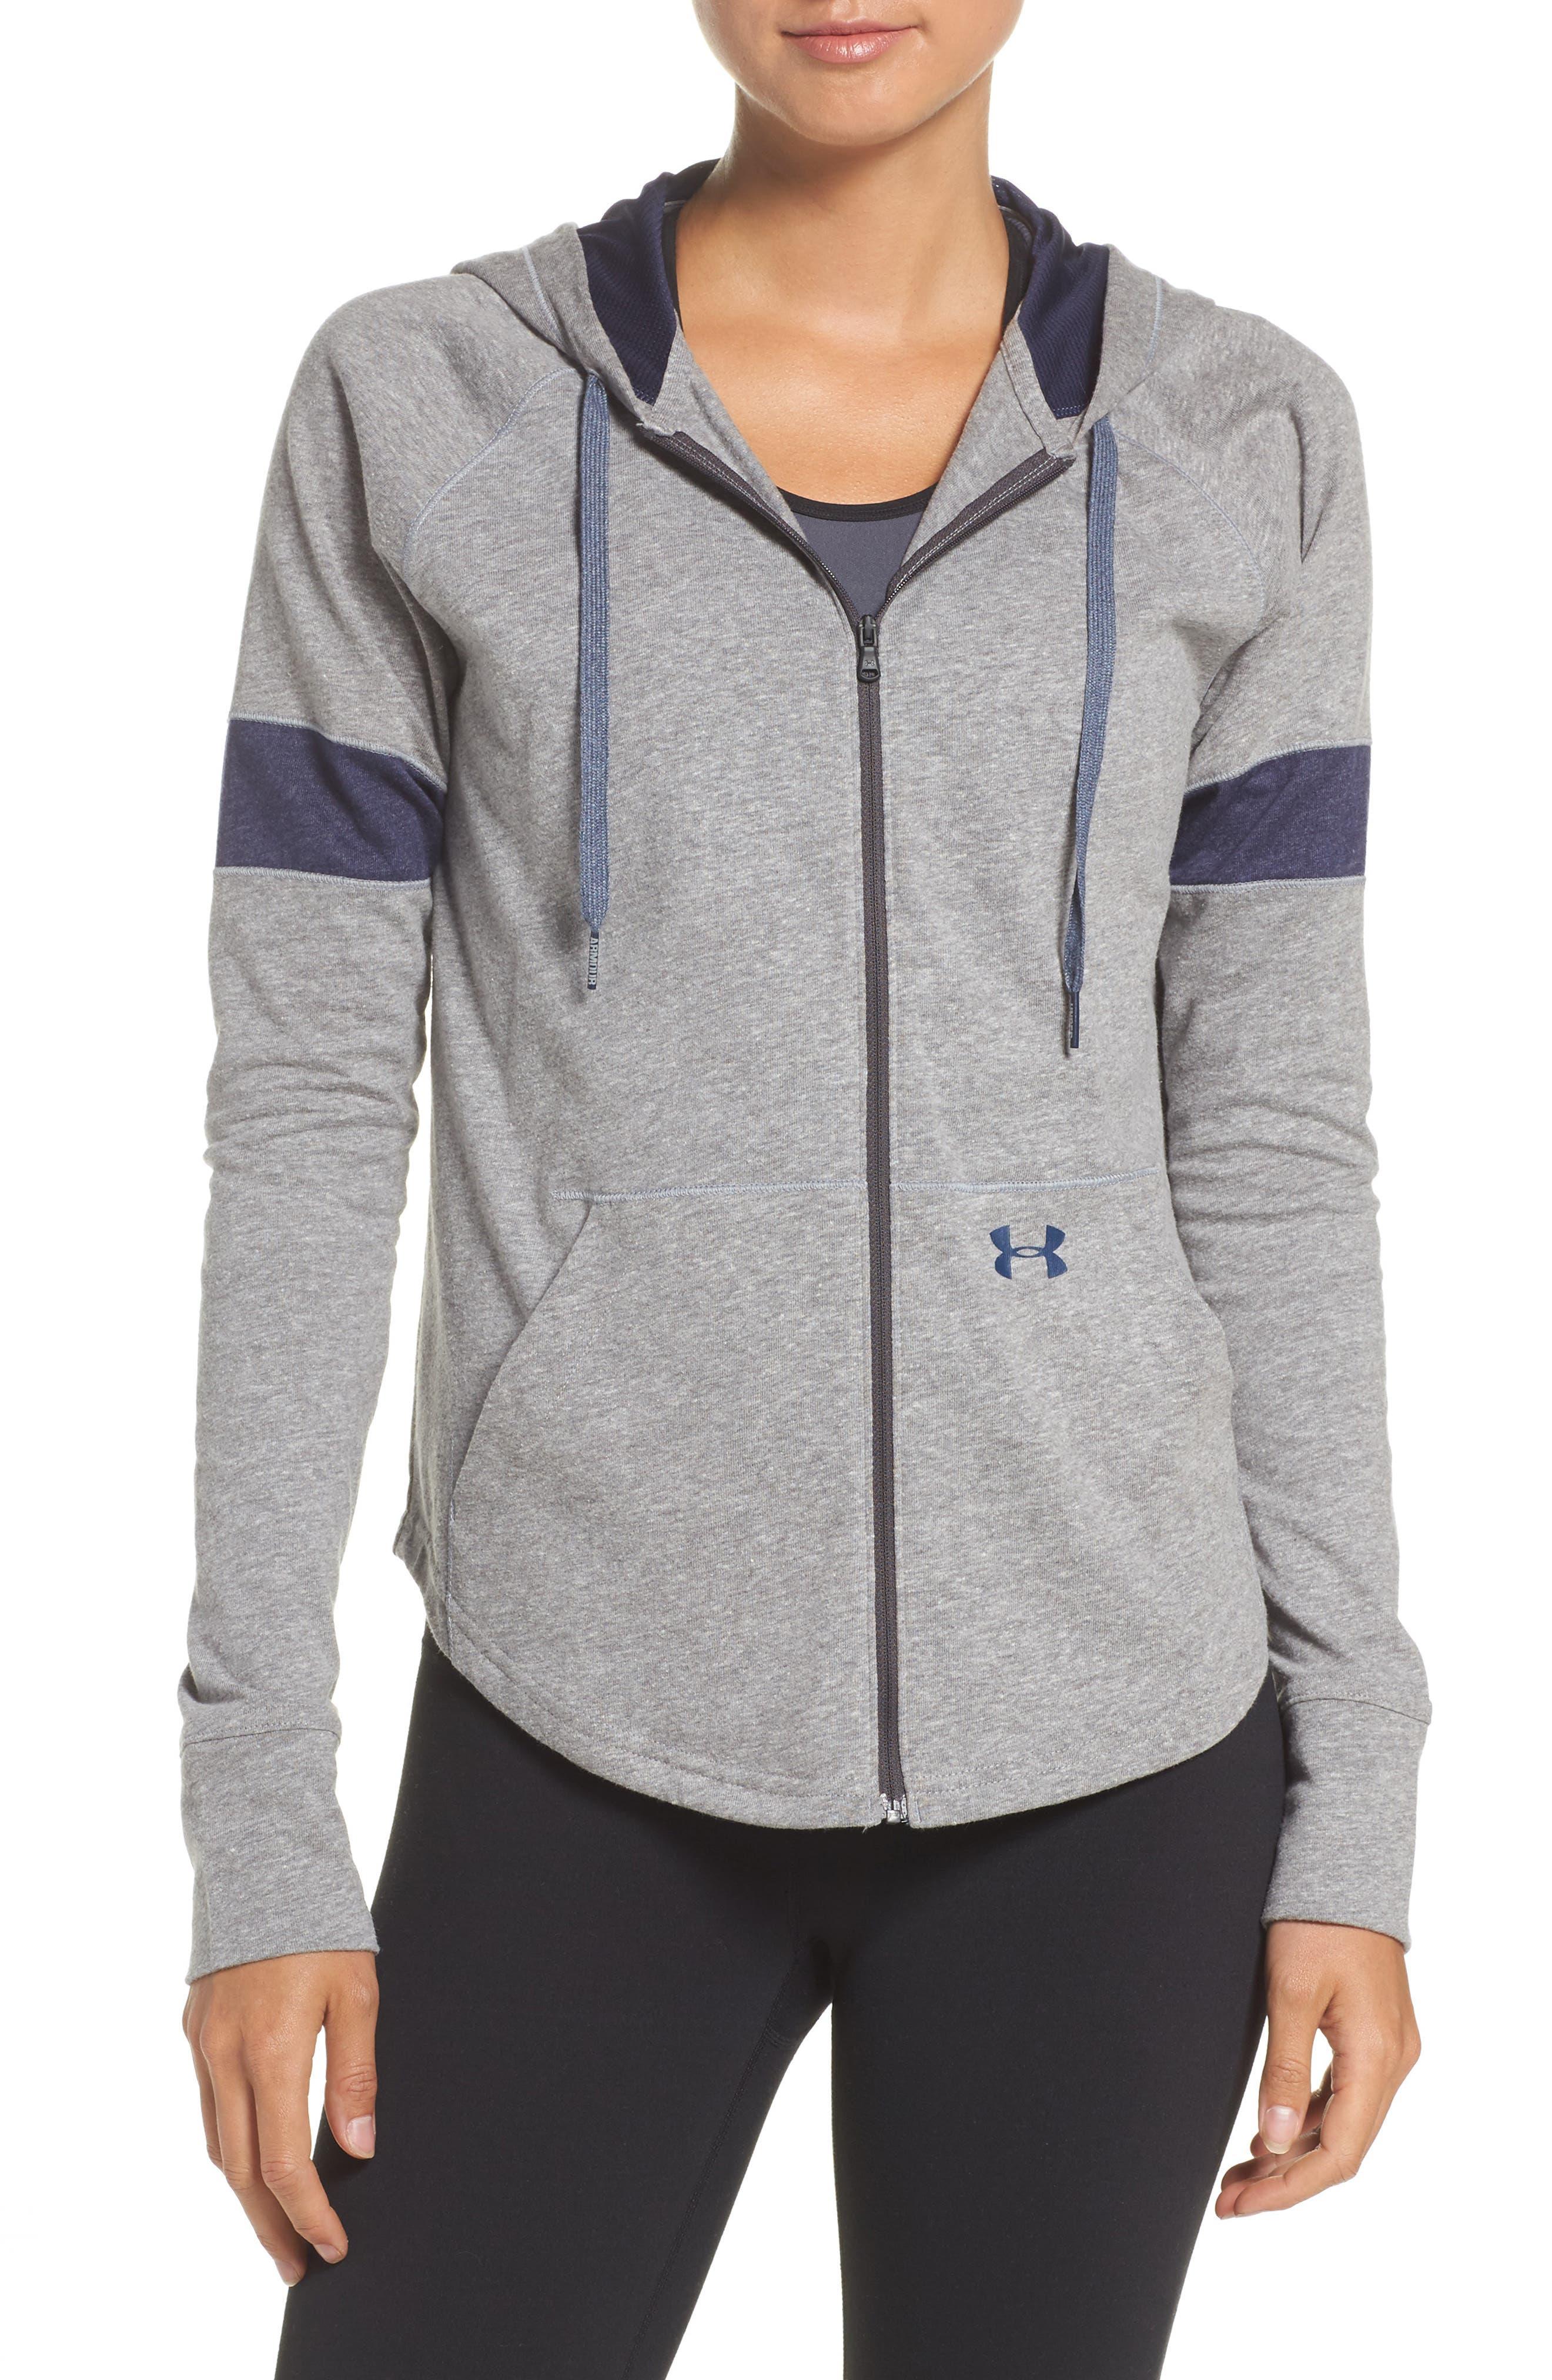 Zip Hoodie,                         Main,                         color, Charcoal/ Midnight Navy